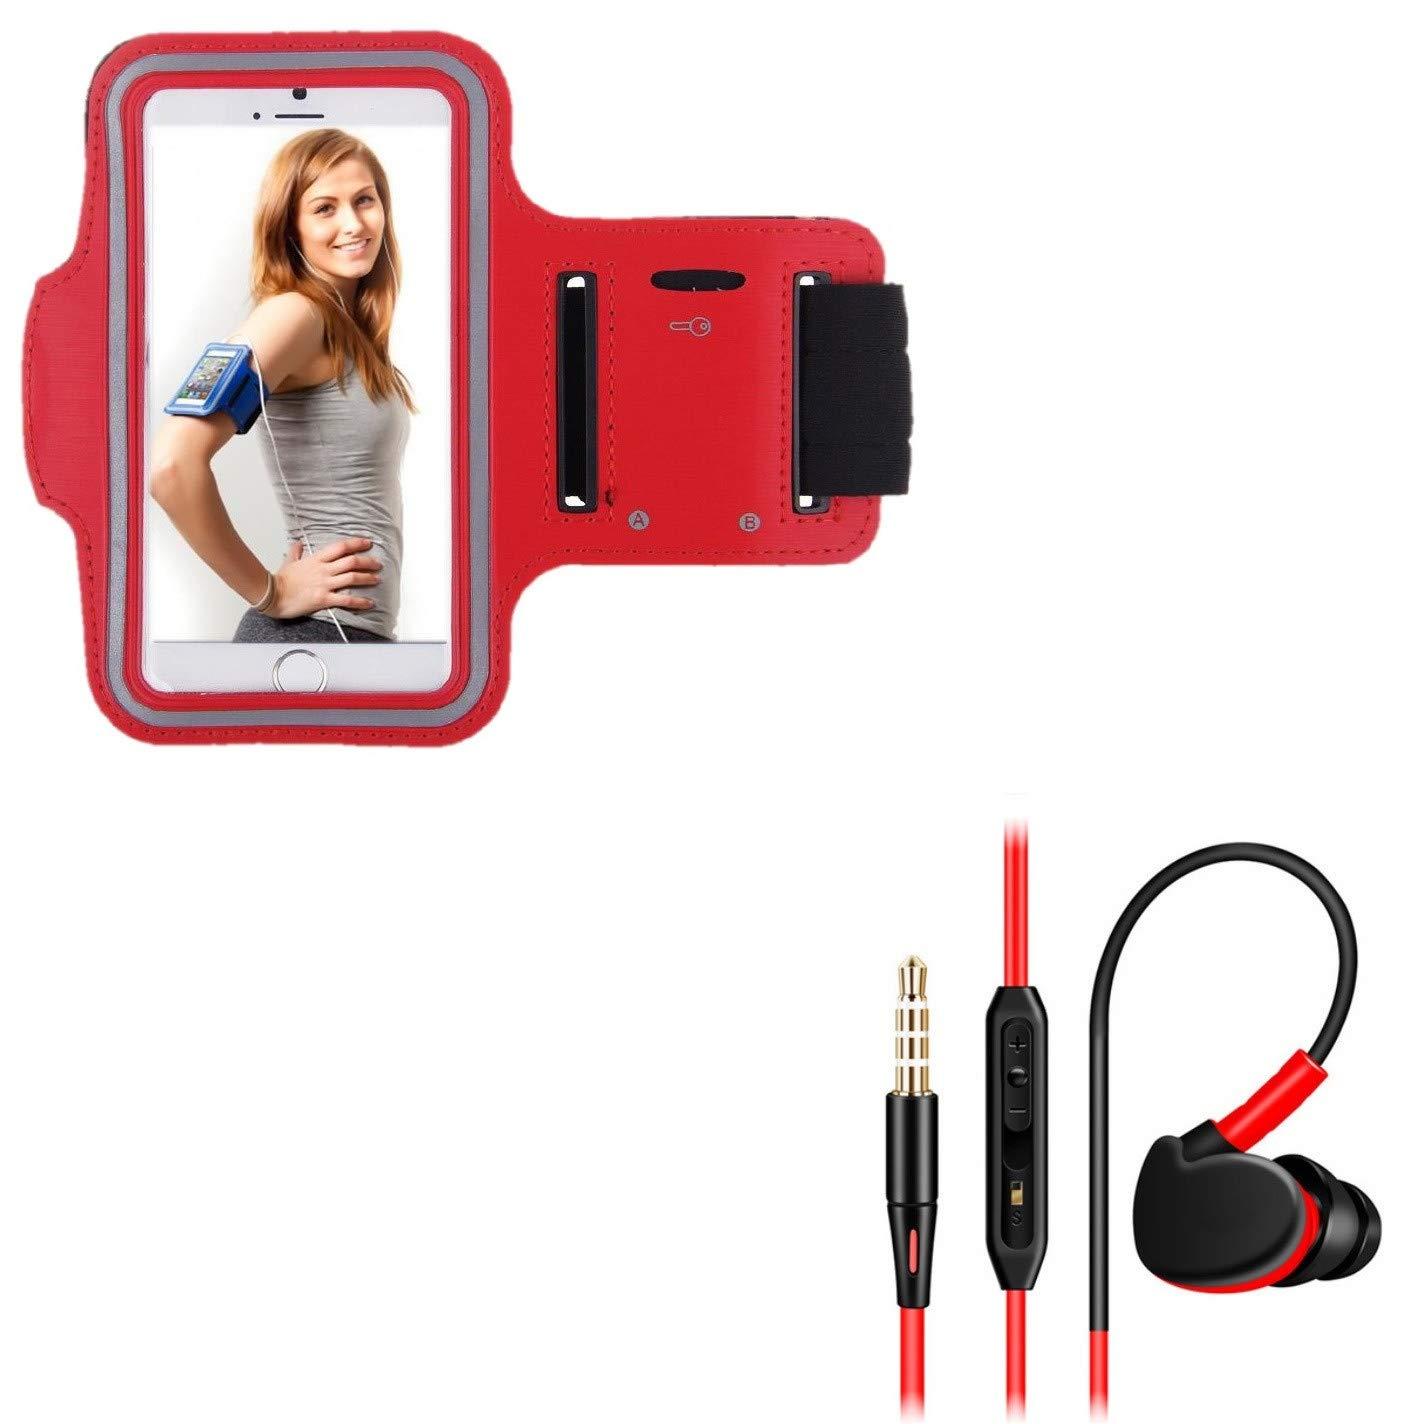 Pack Deportivo para Sony Xperia 10 Smartphone (Brazalete Deportivo + Auriculares in-Ear con micrófono) Courir T7 (Rojo): Amazon.es: Electrónica